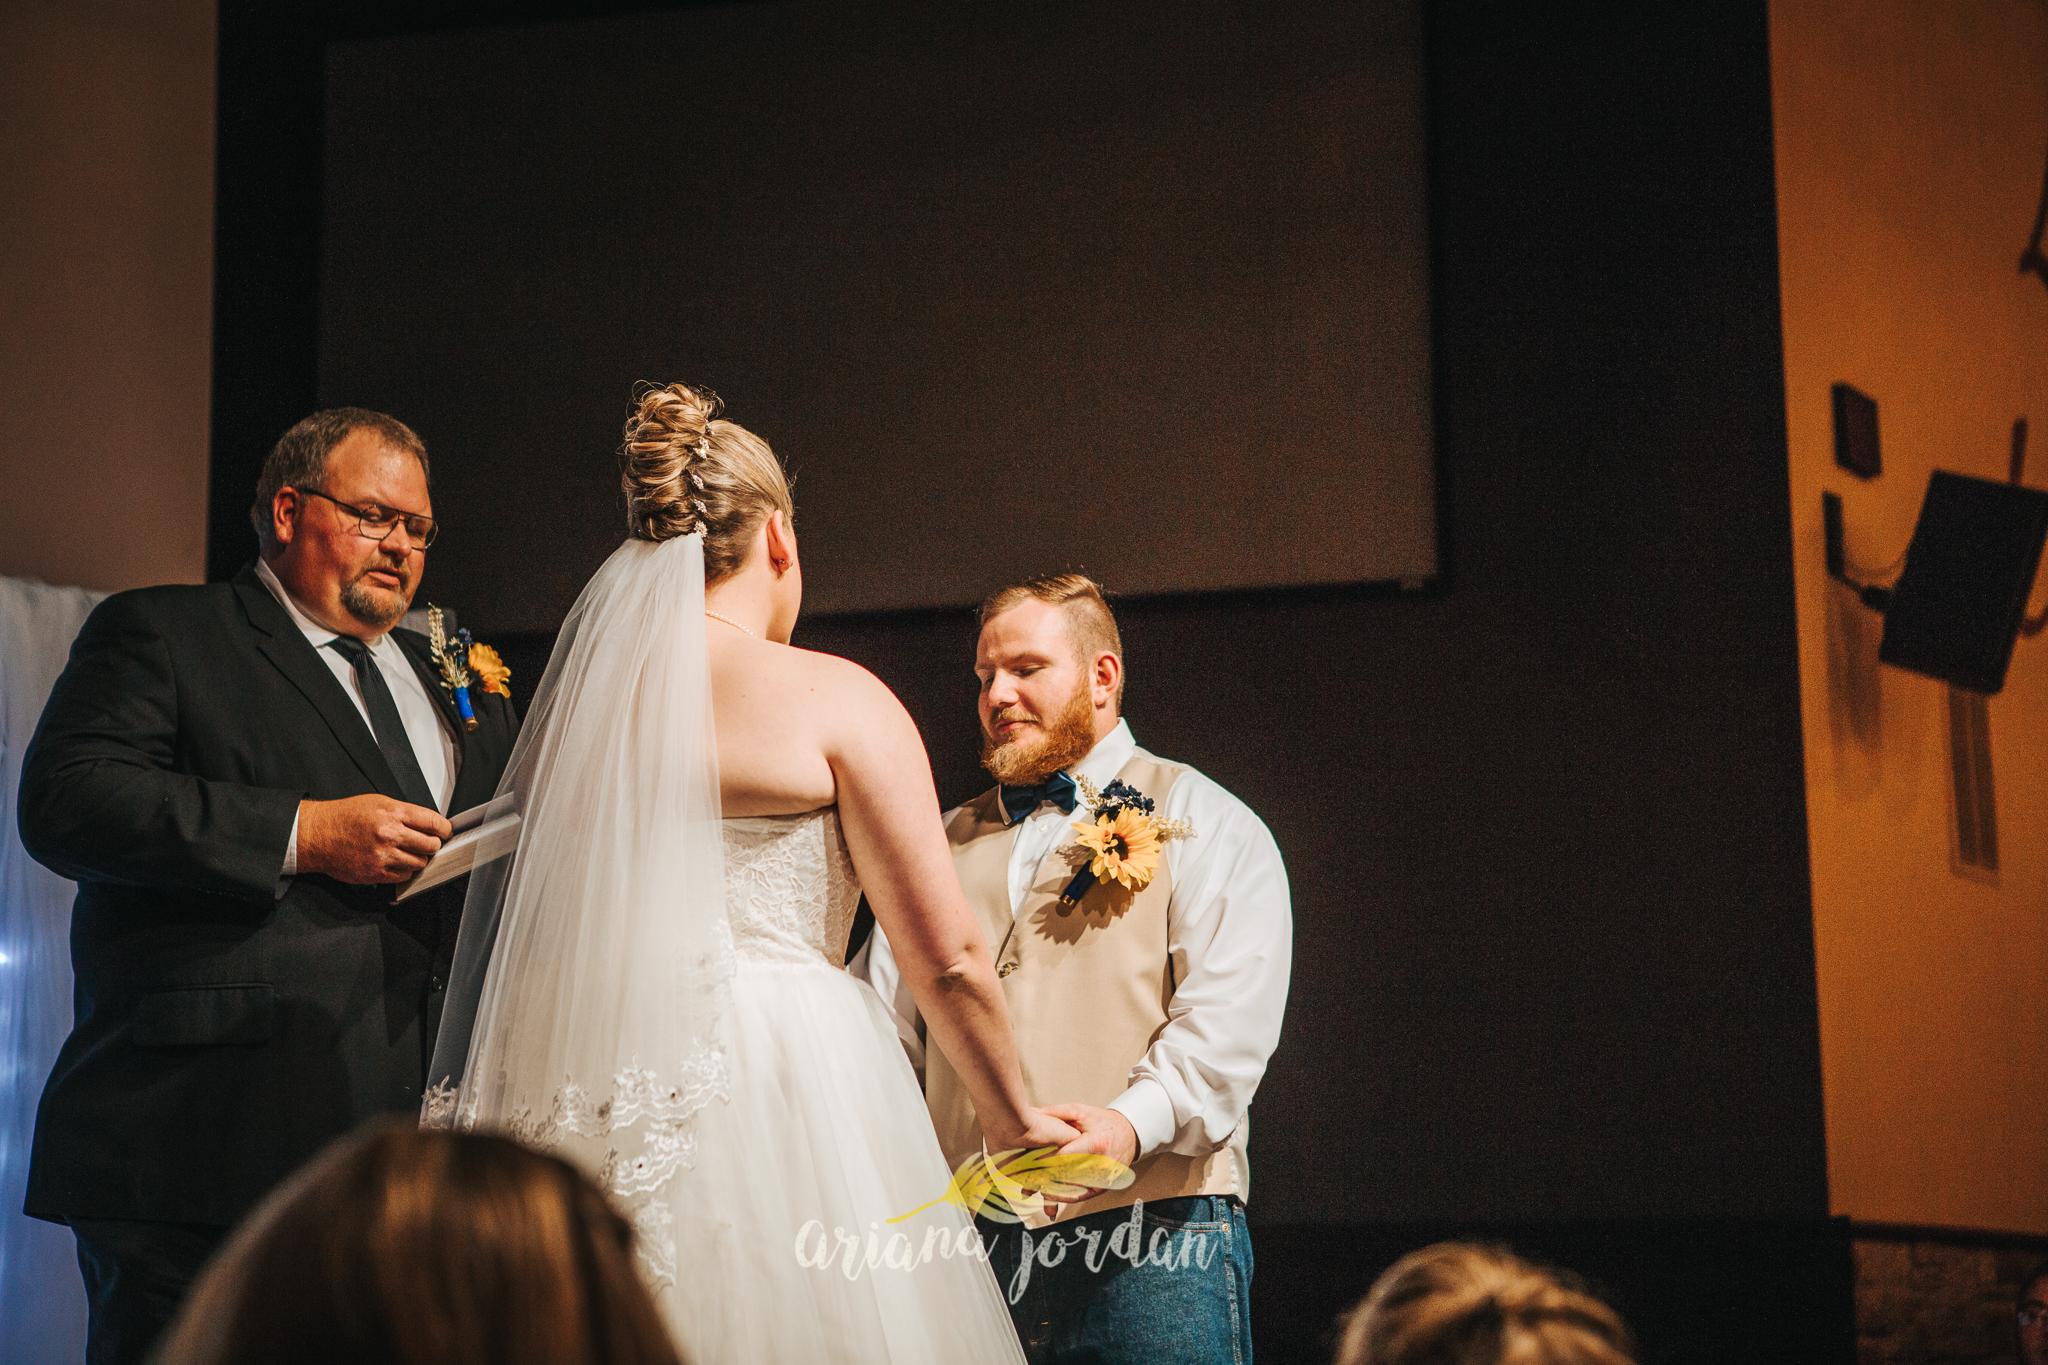 0030 Ariana Jordan Photography - Georgetown KY Wedding Photographer 7661.jpg